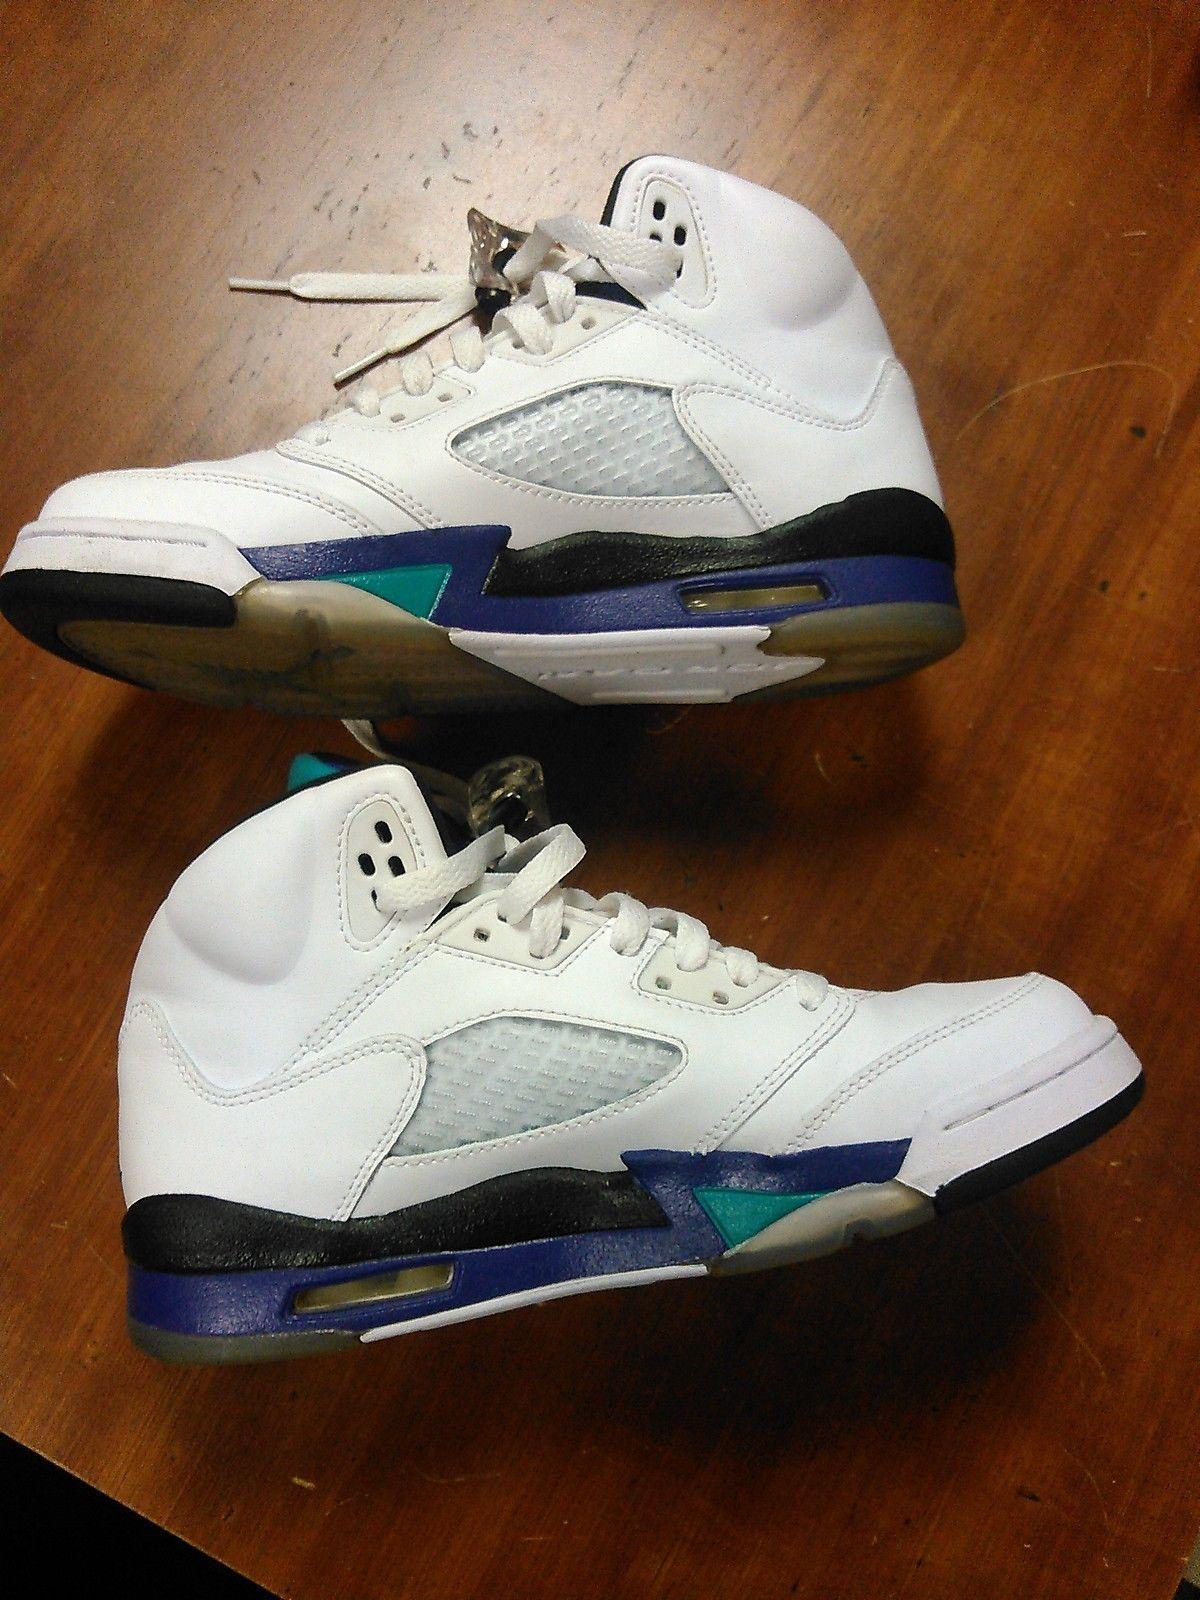 f20953fb8c6 Nike Retro Air Jordan 5 White Grape Size 6Y and 50 similar items. S l1600